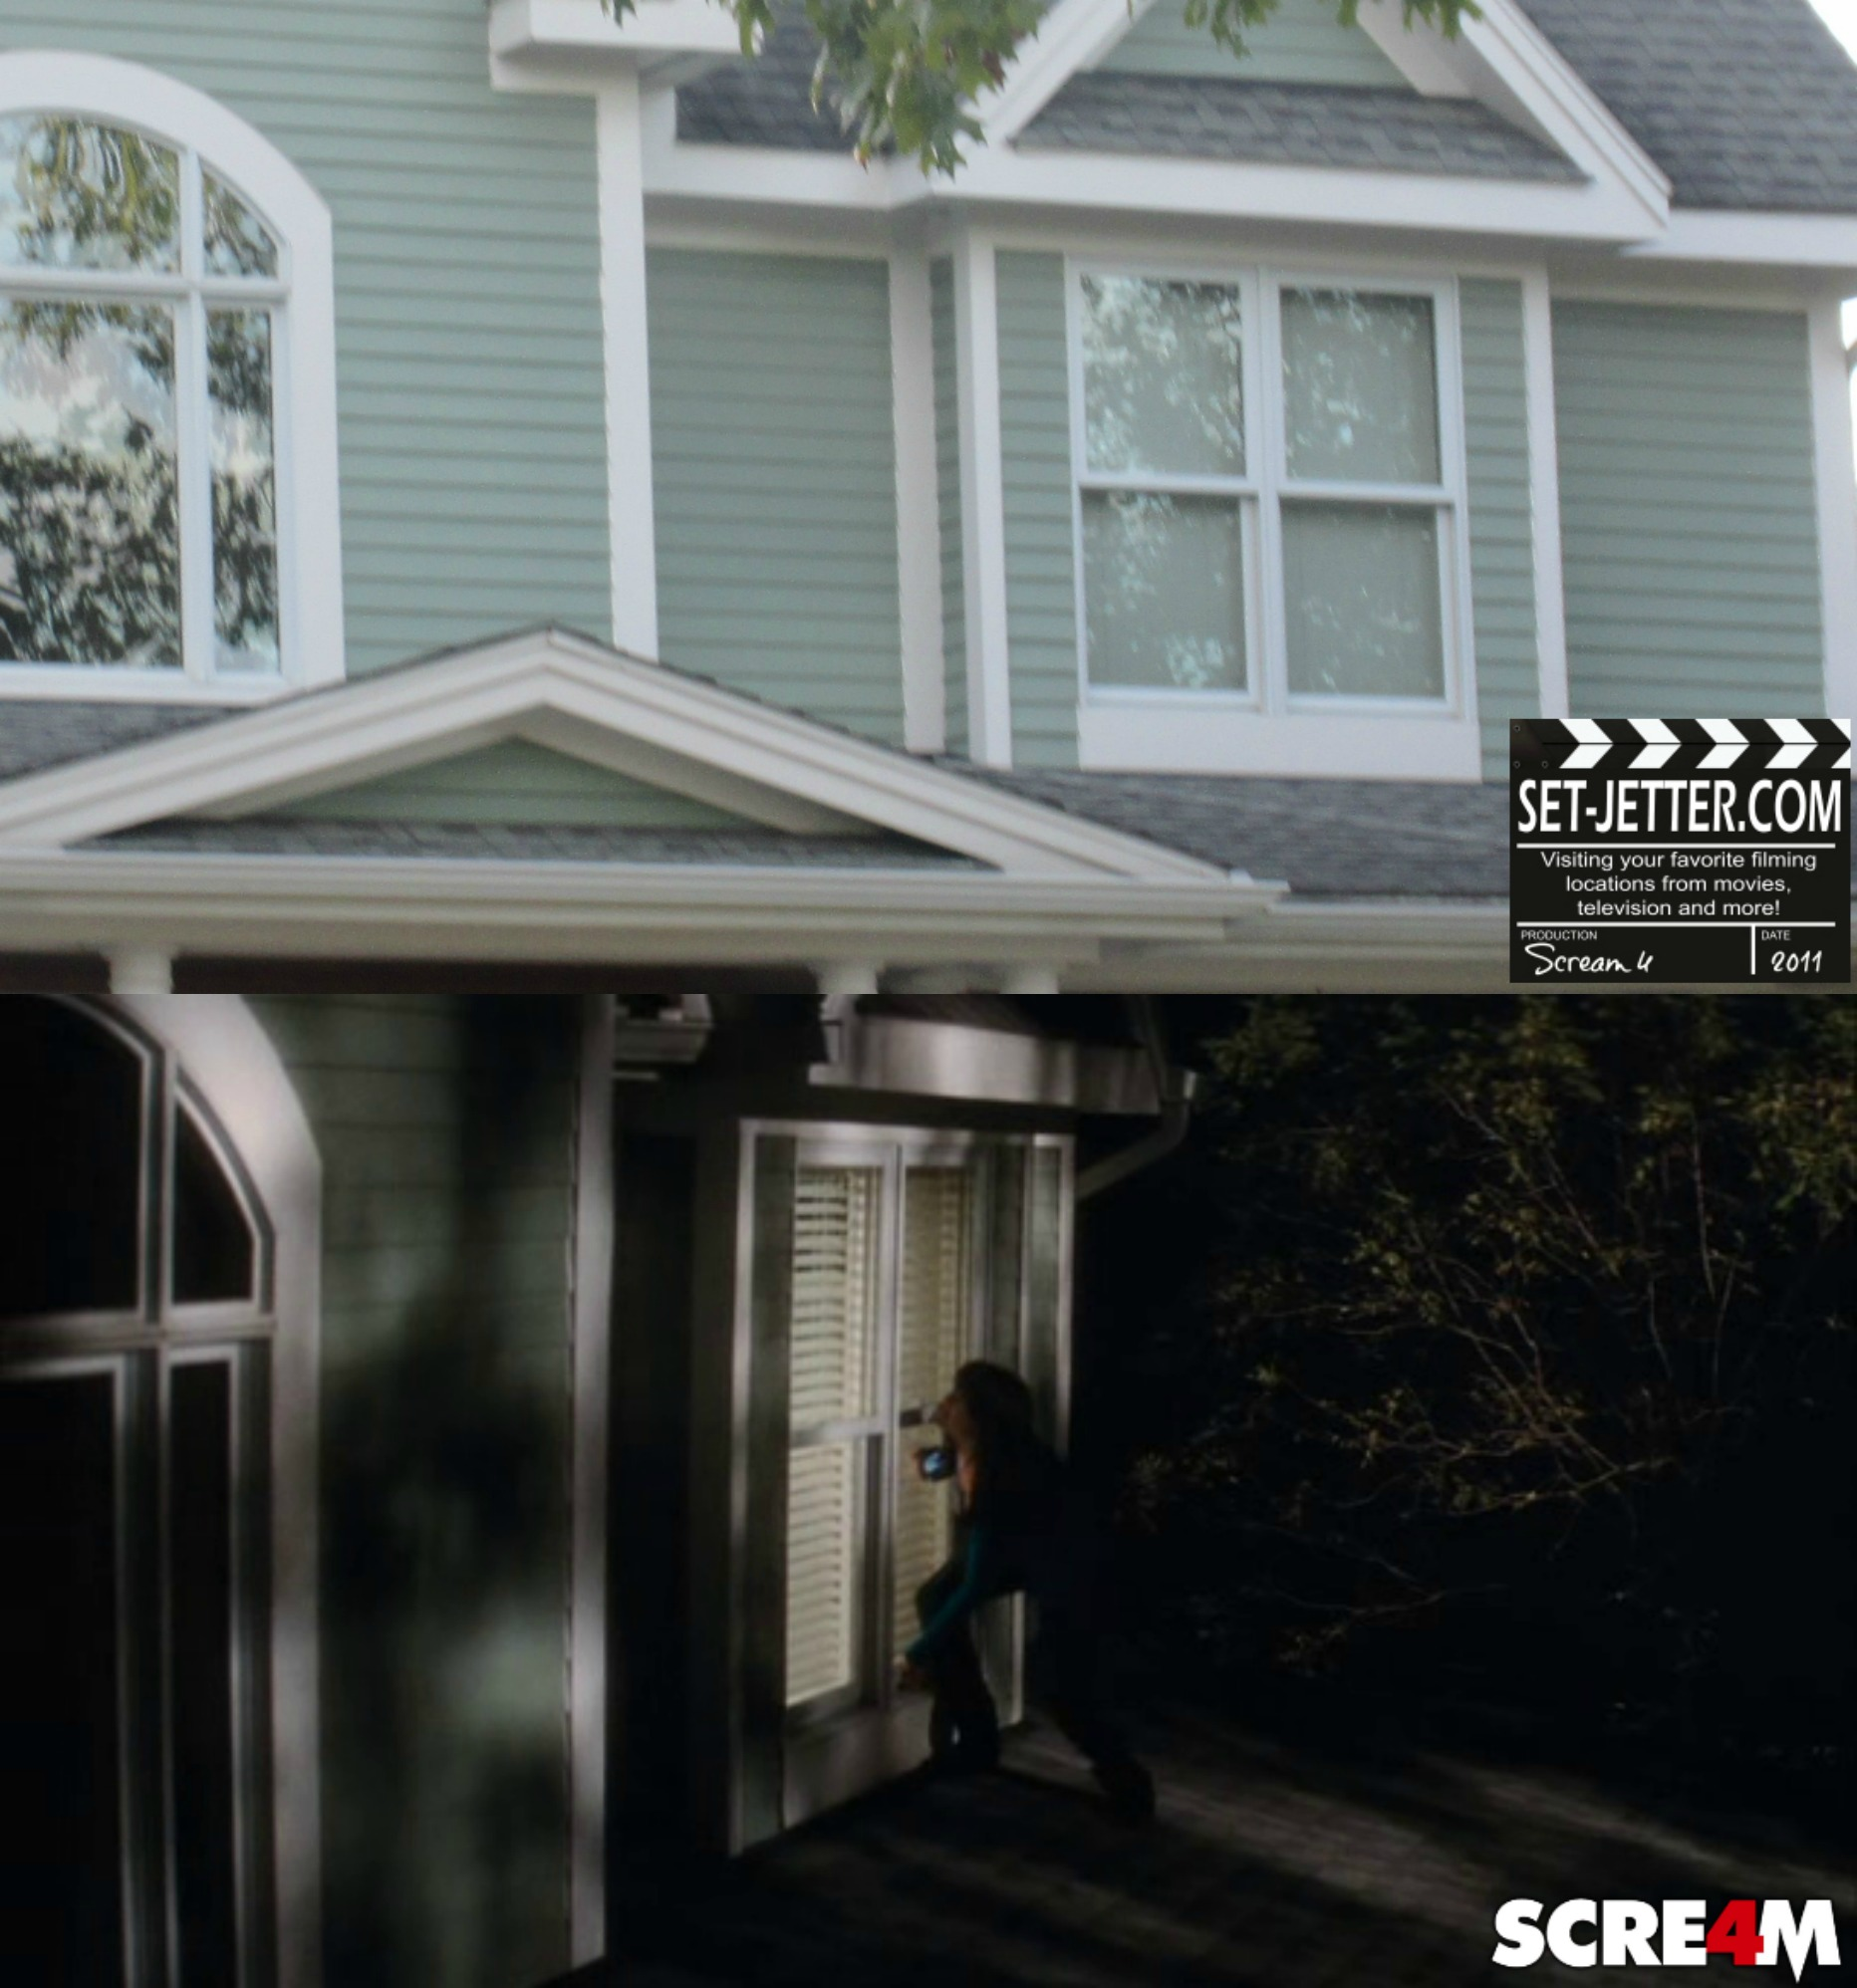 Scream4 comparison 145.jpg